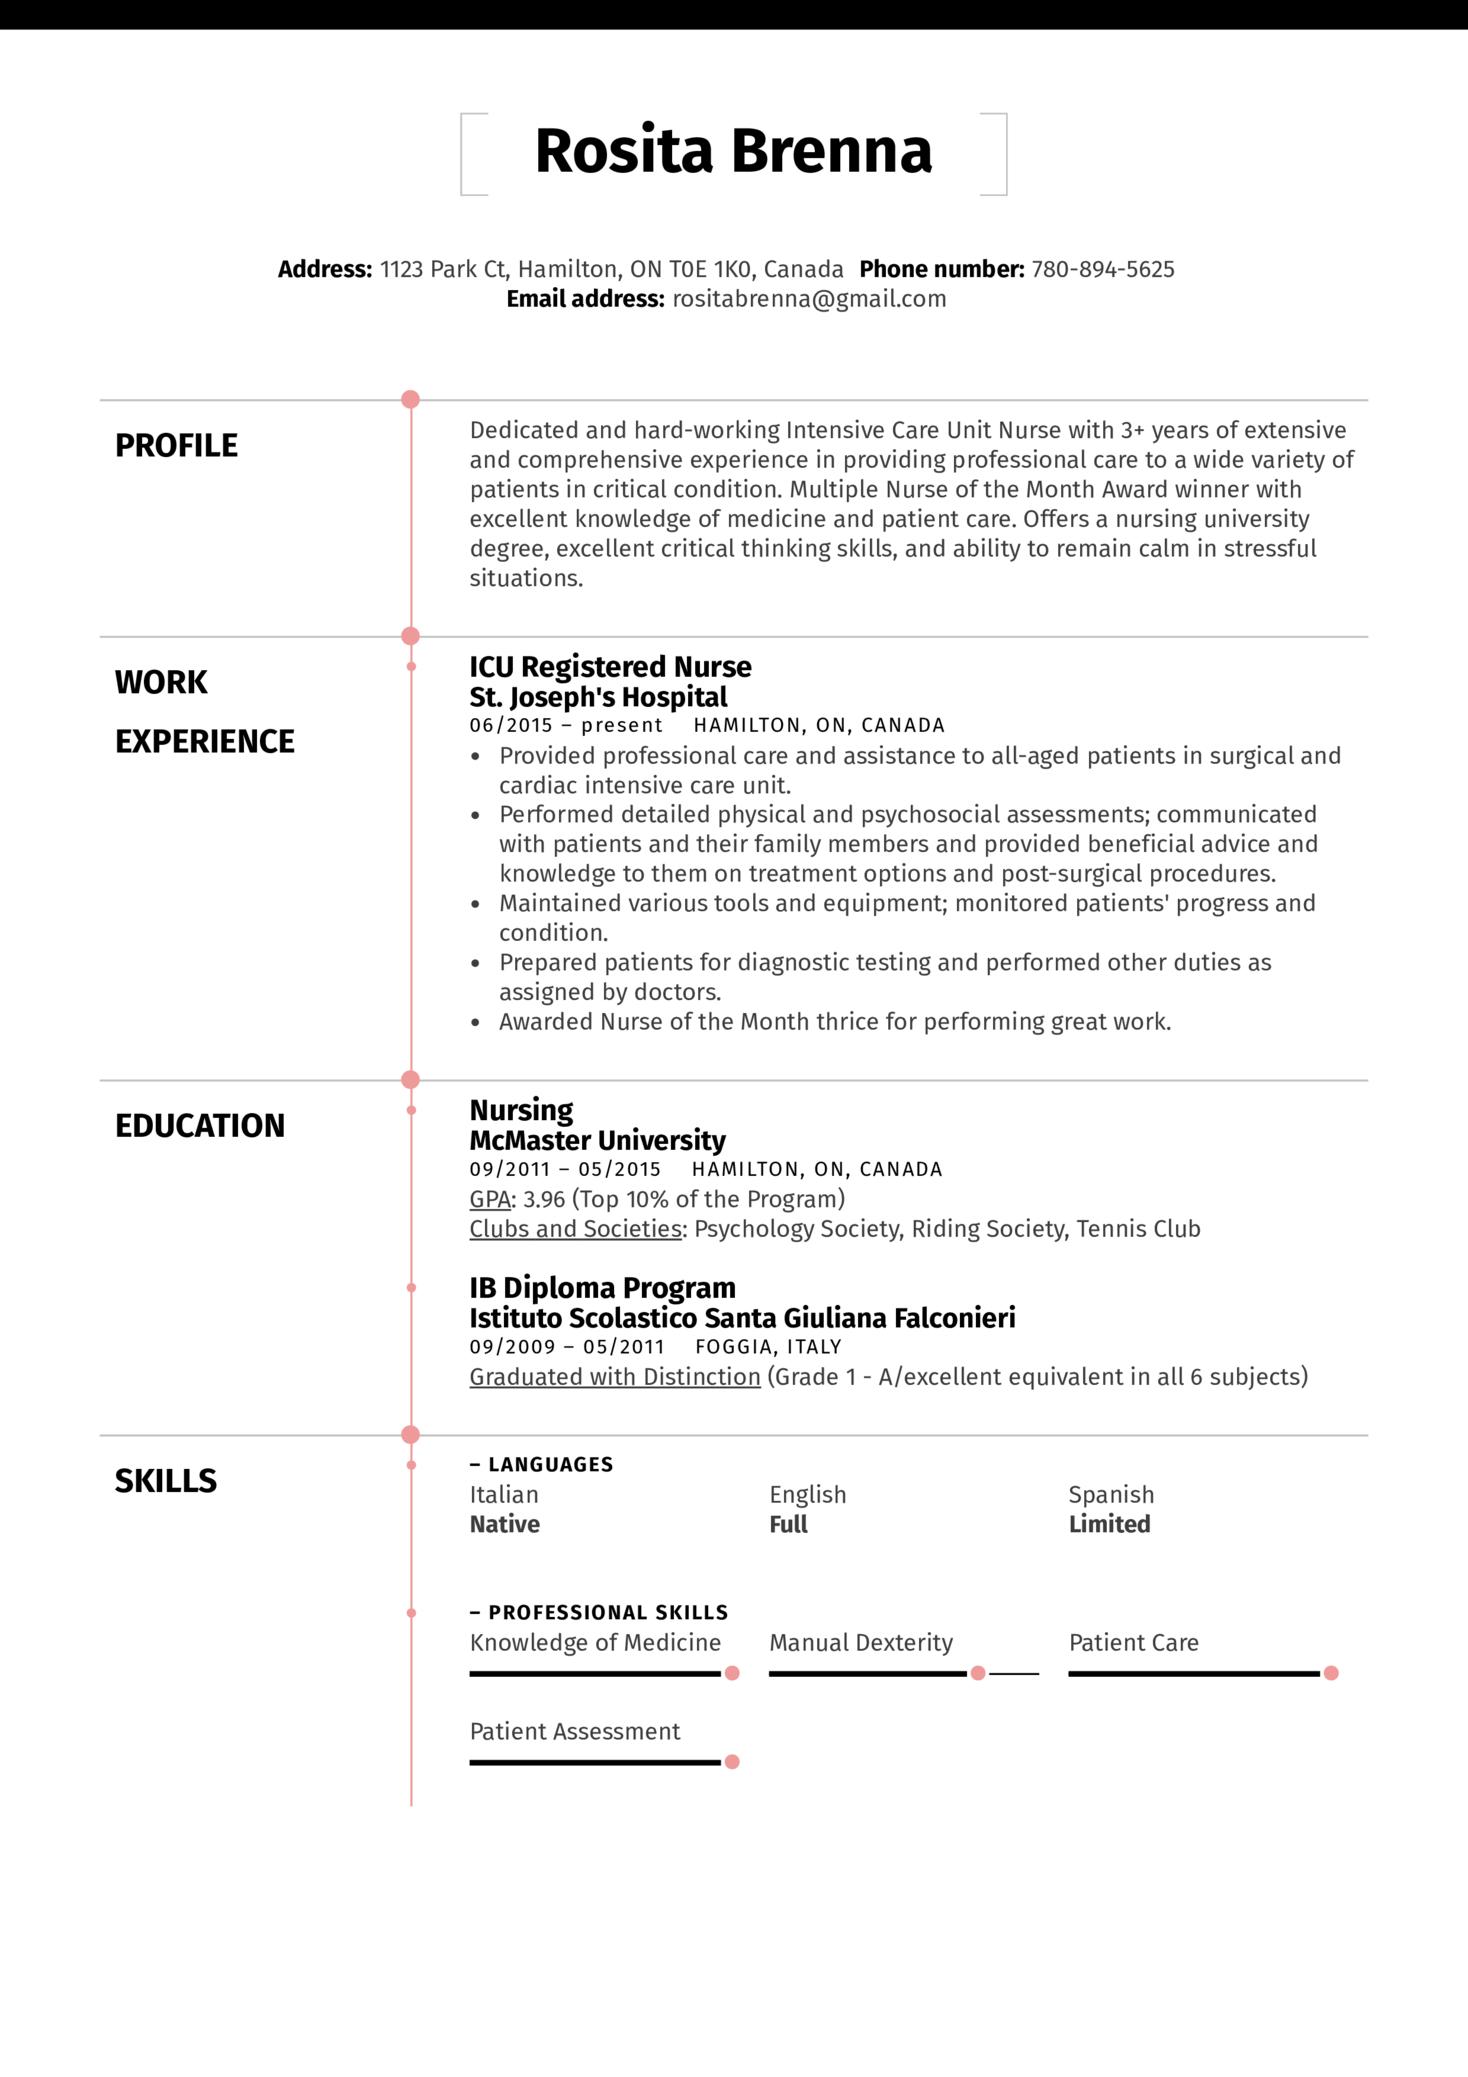 ICU Registered Nurse Resume Example (Part 1)